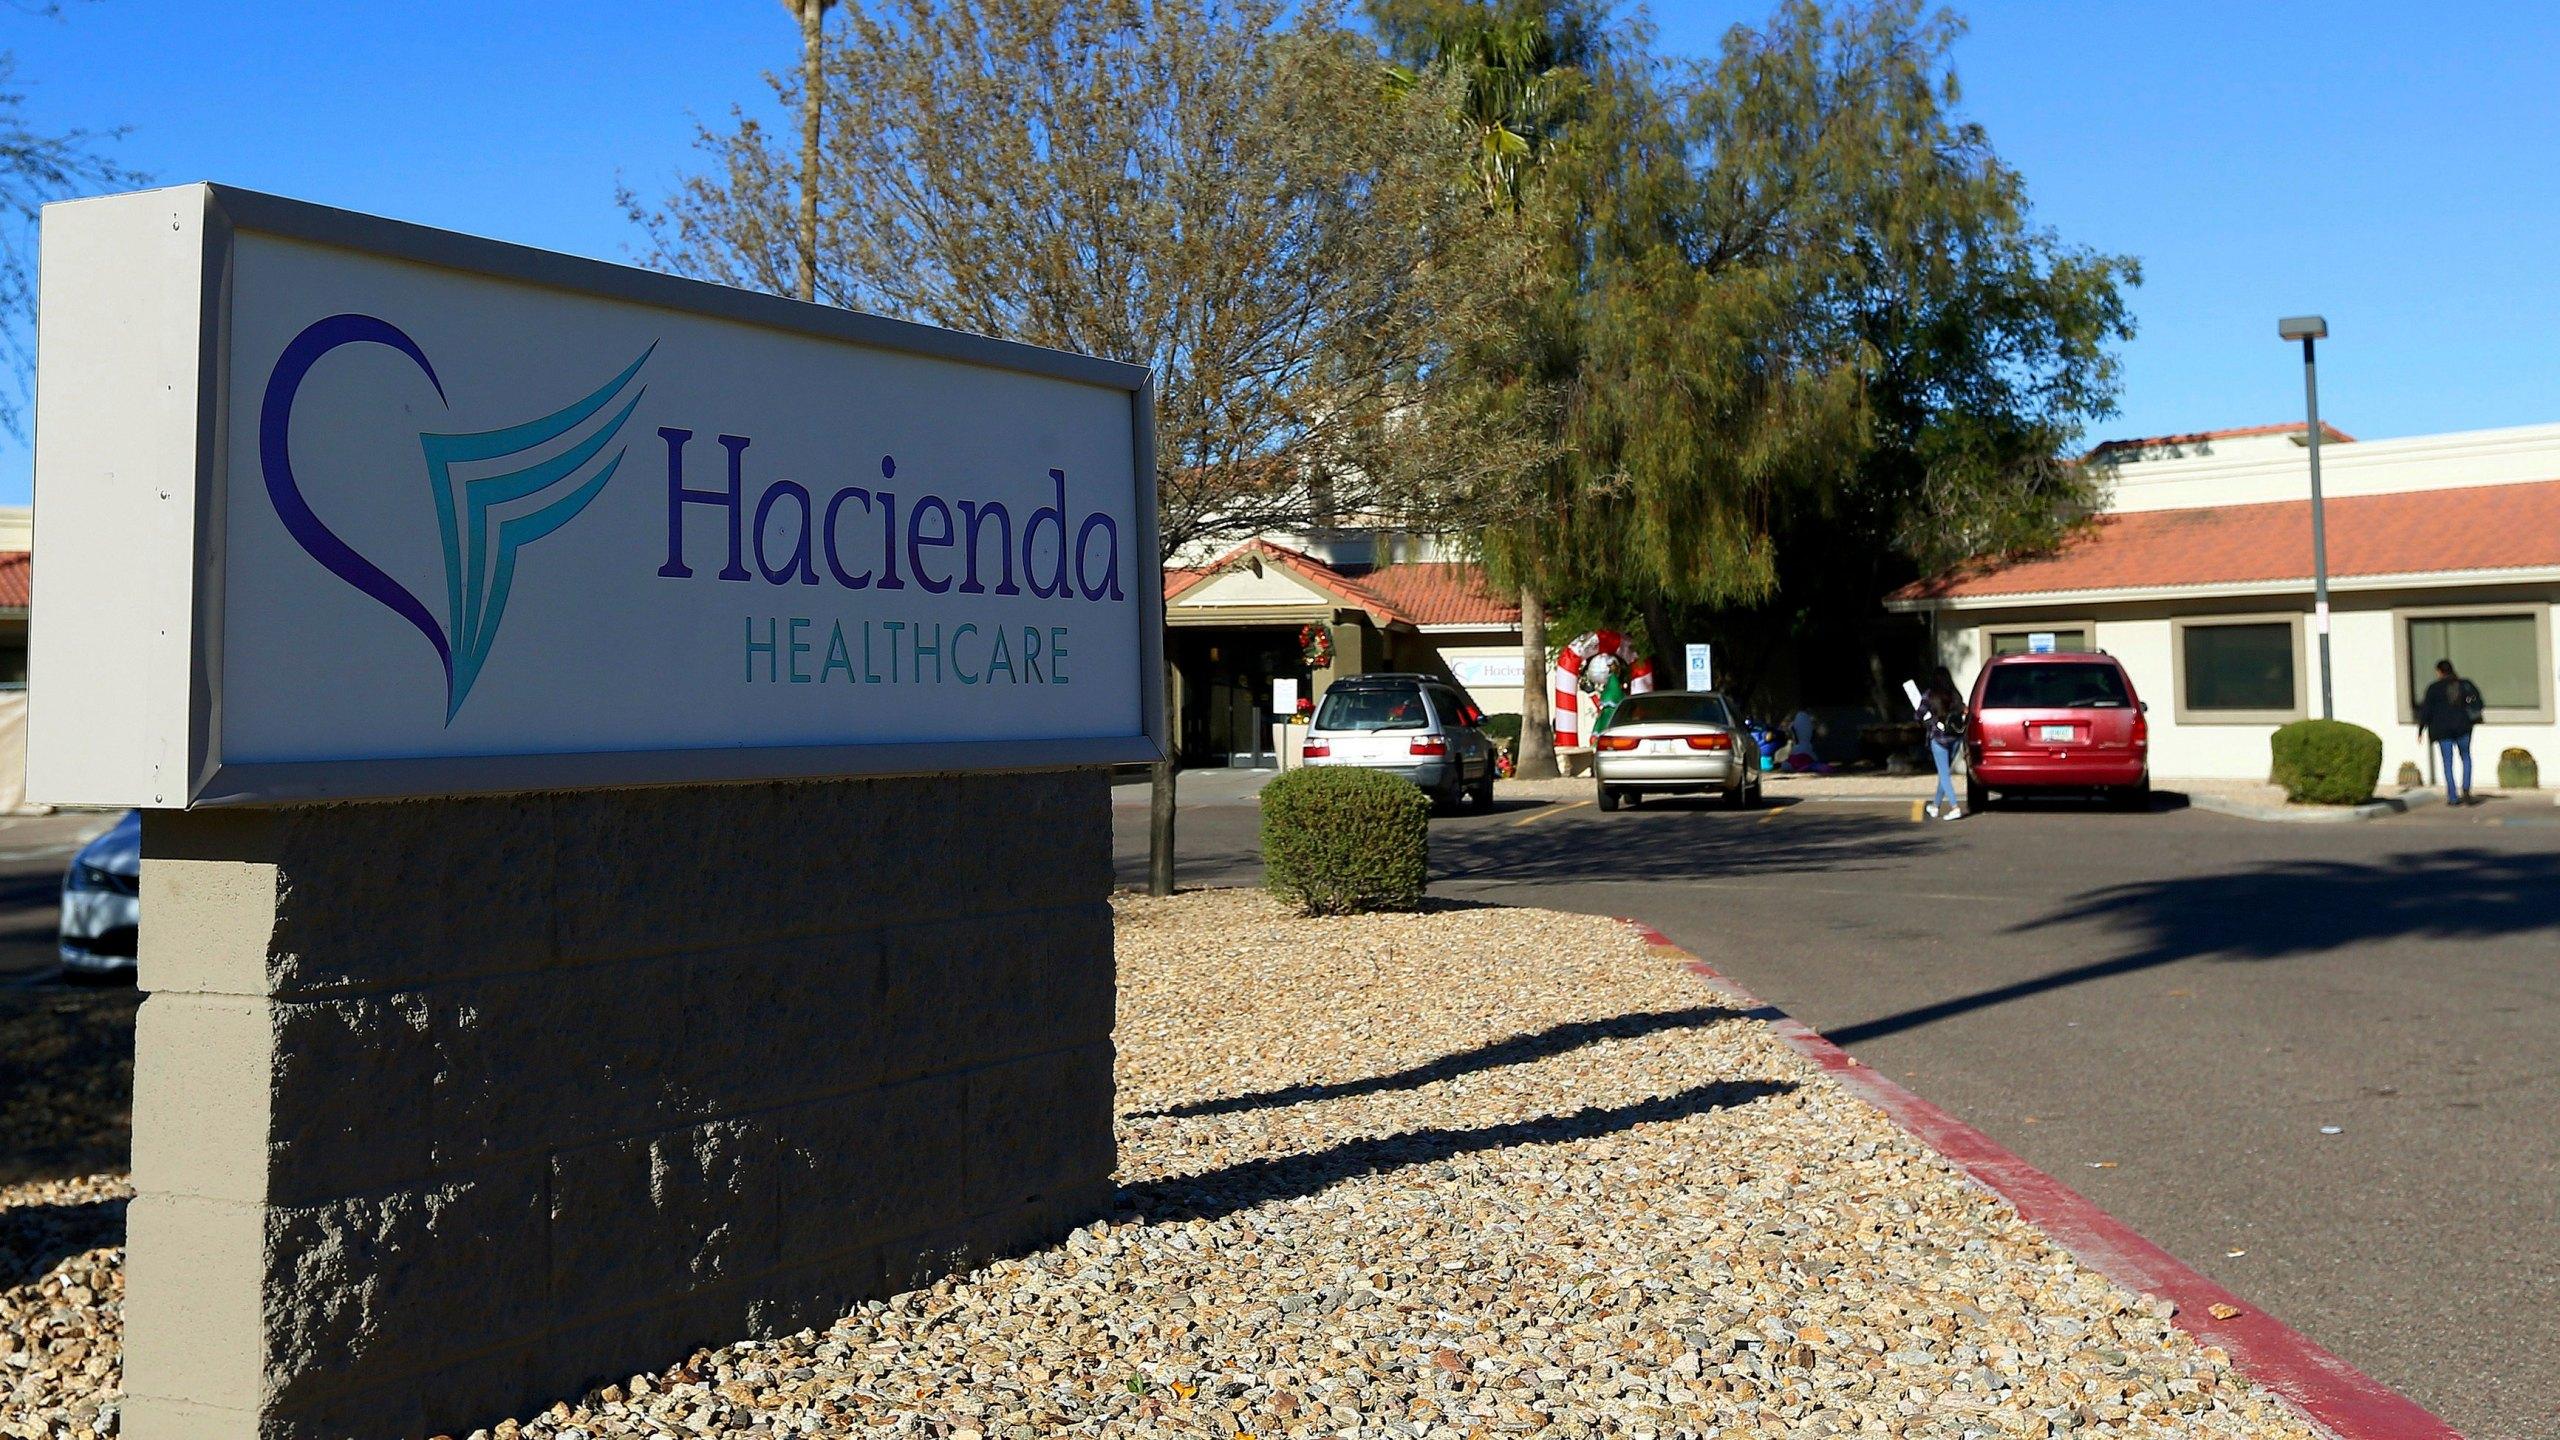 Hacienda-Healthcare_1548262872543.jpg